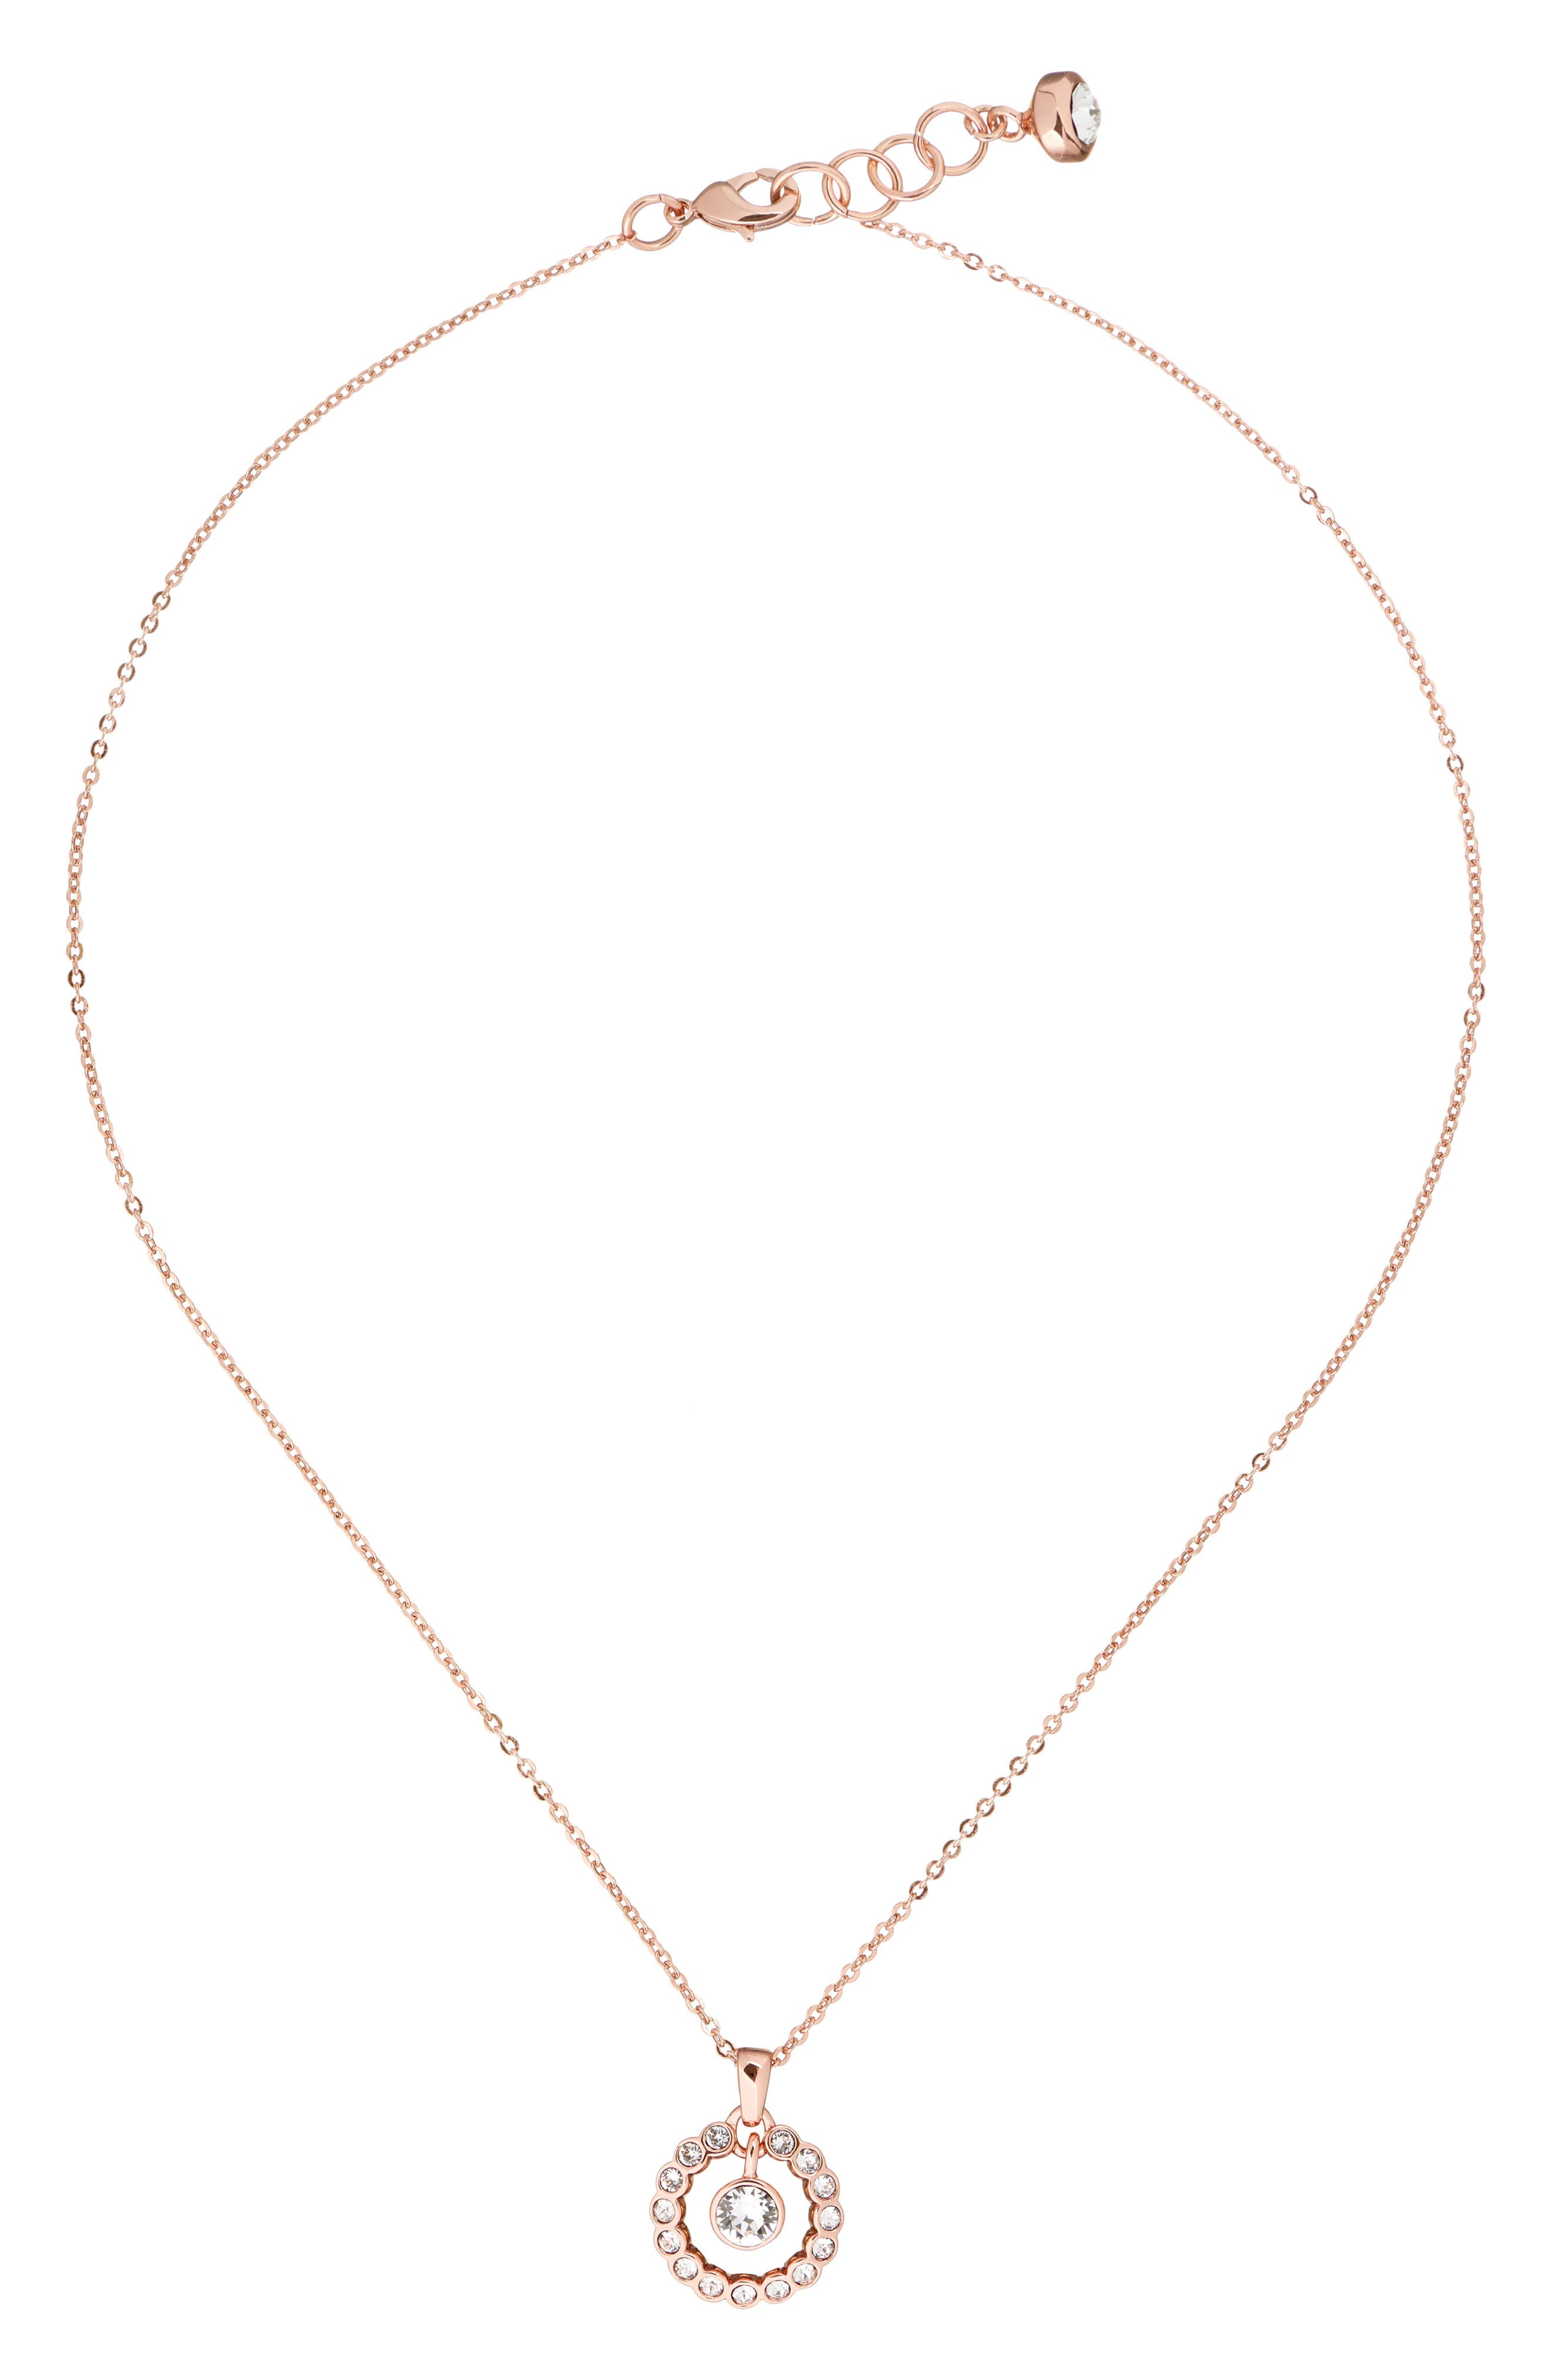 Crystal Circle Pendant Necklace,                             Main thumbnail 1, color,